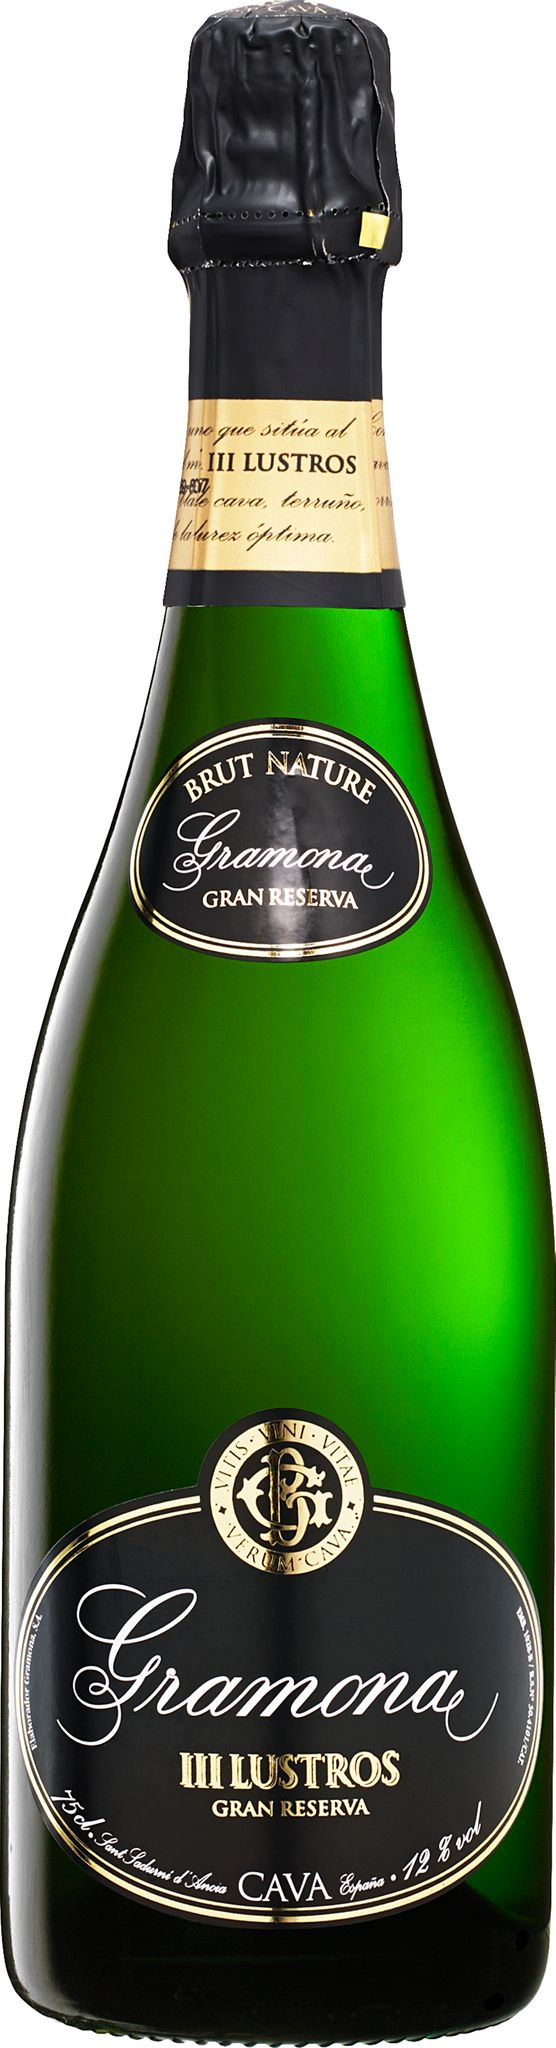 Produktbild på Gramona III Lustros